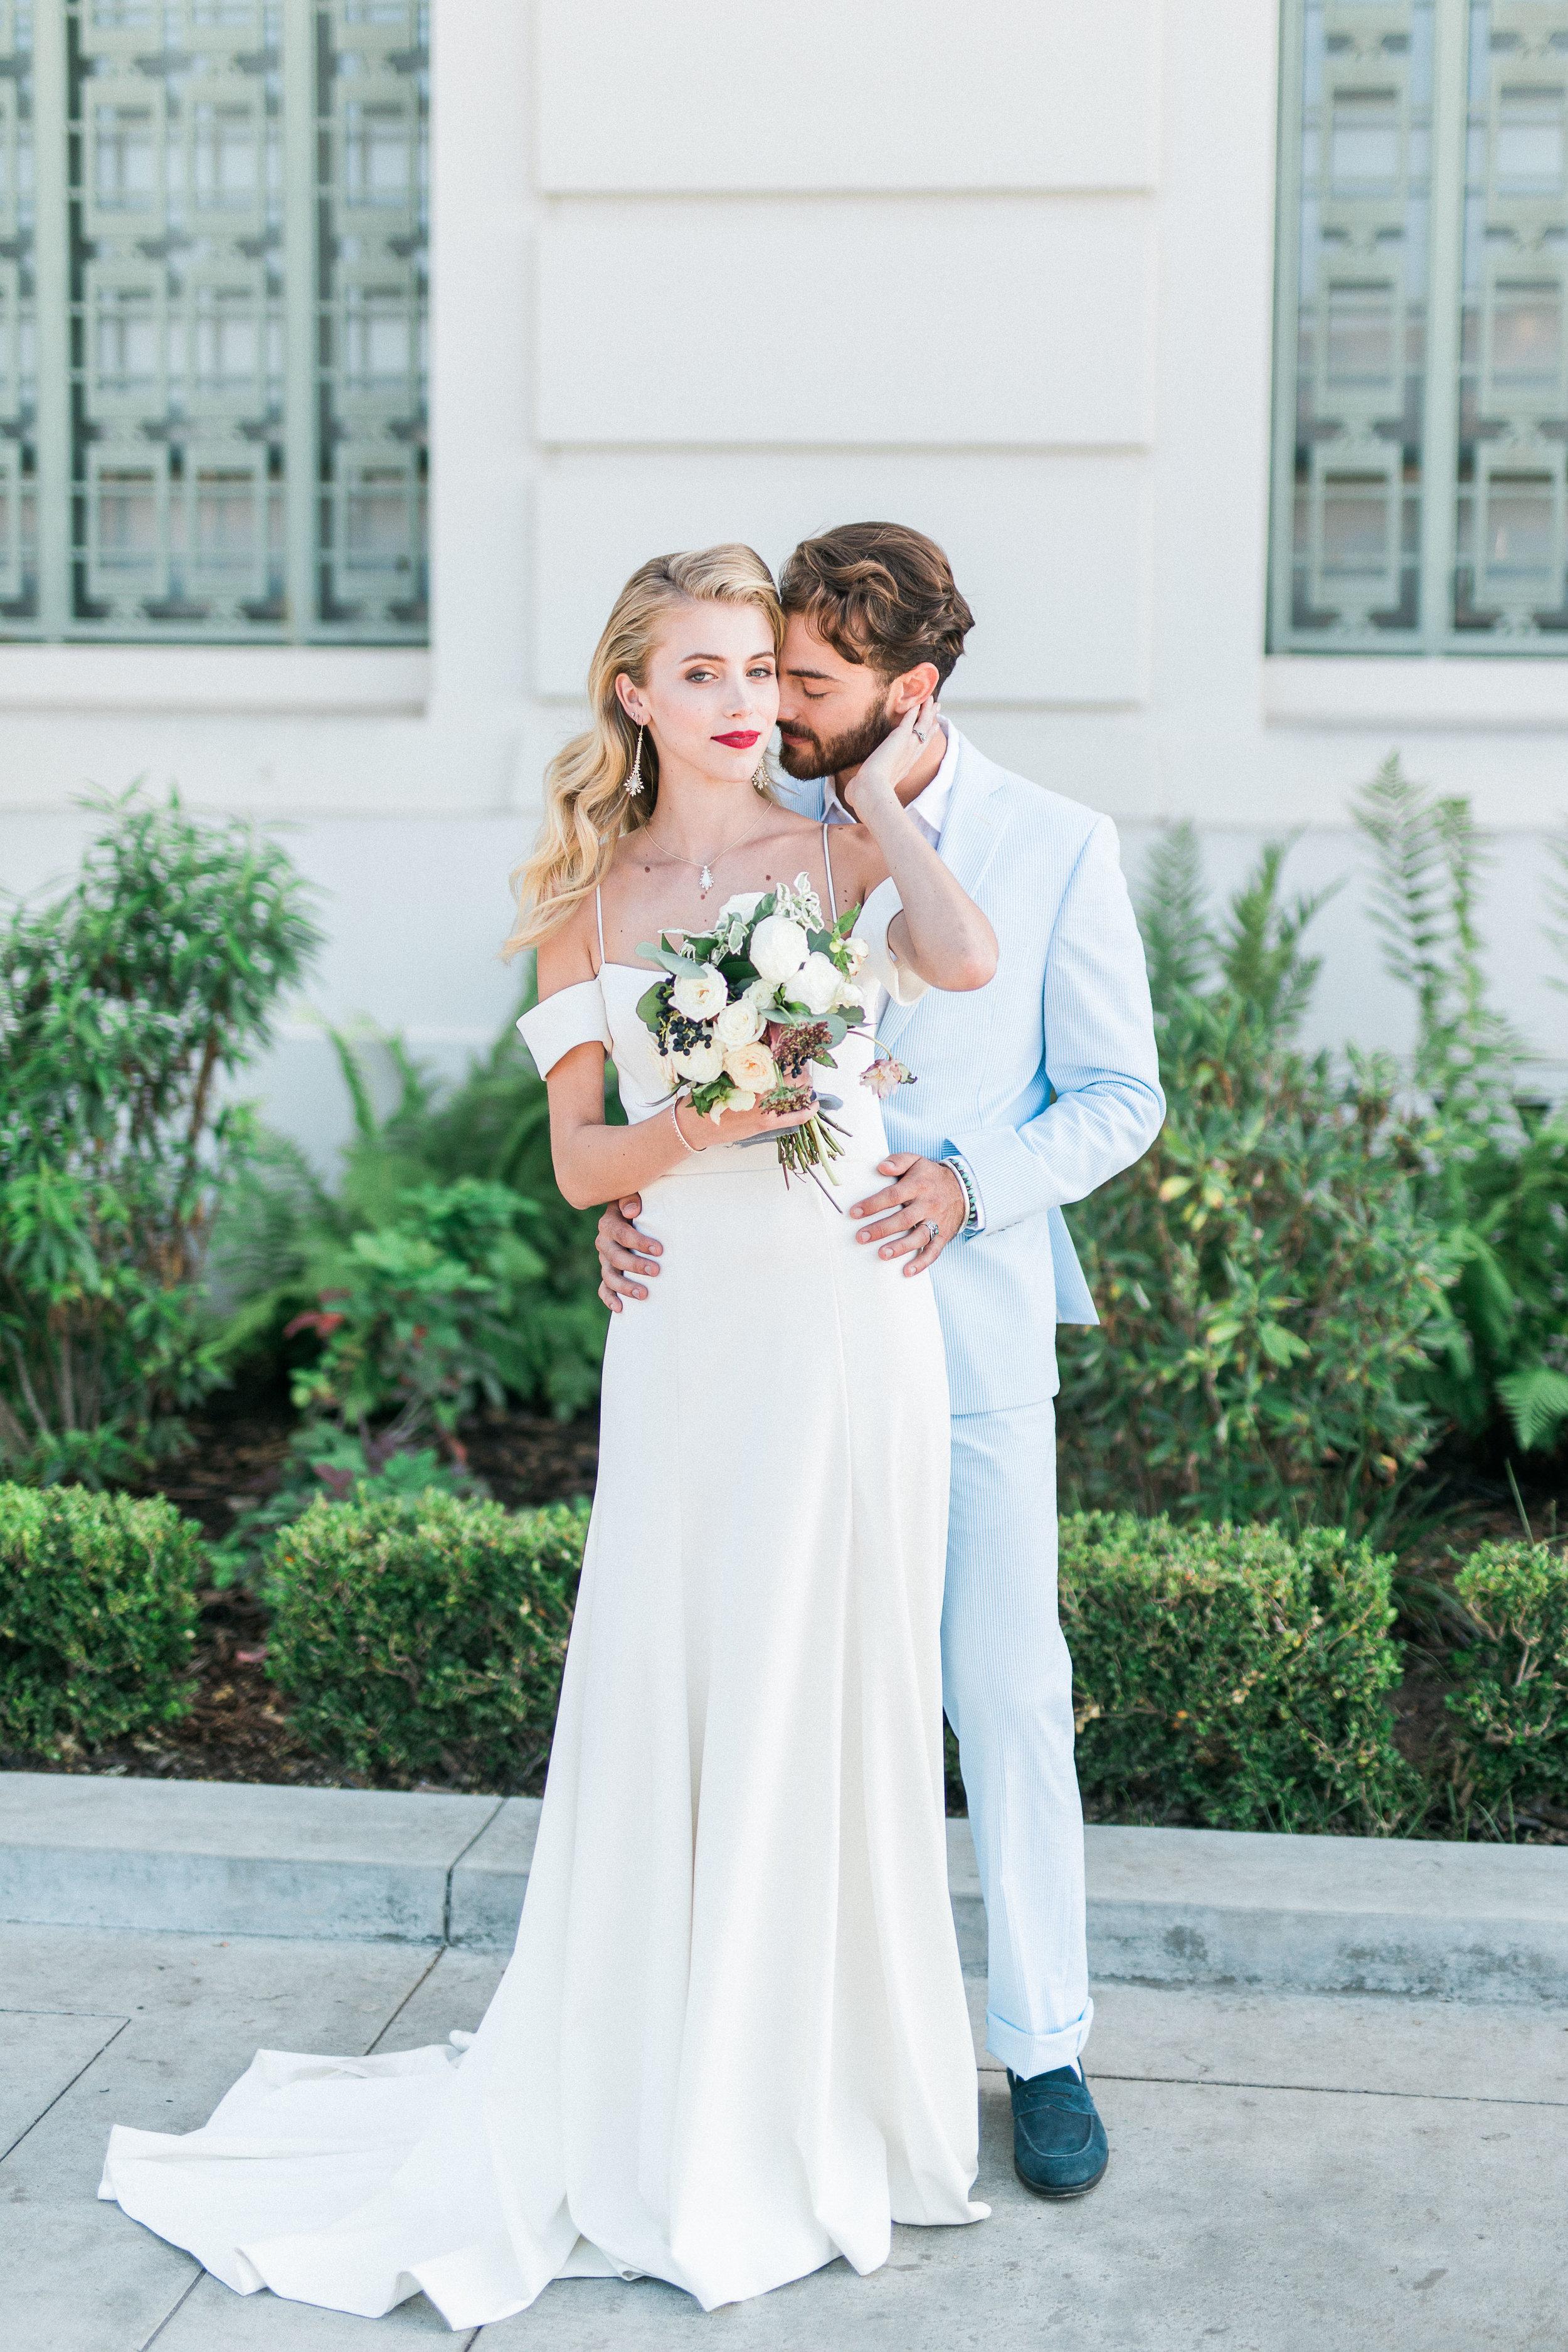 LA-Wedding-Shoot-by-JBJ-Pictures-129.jpg